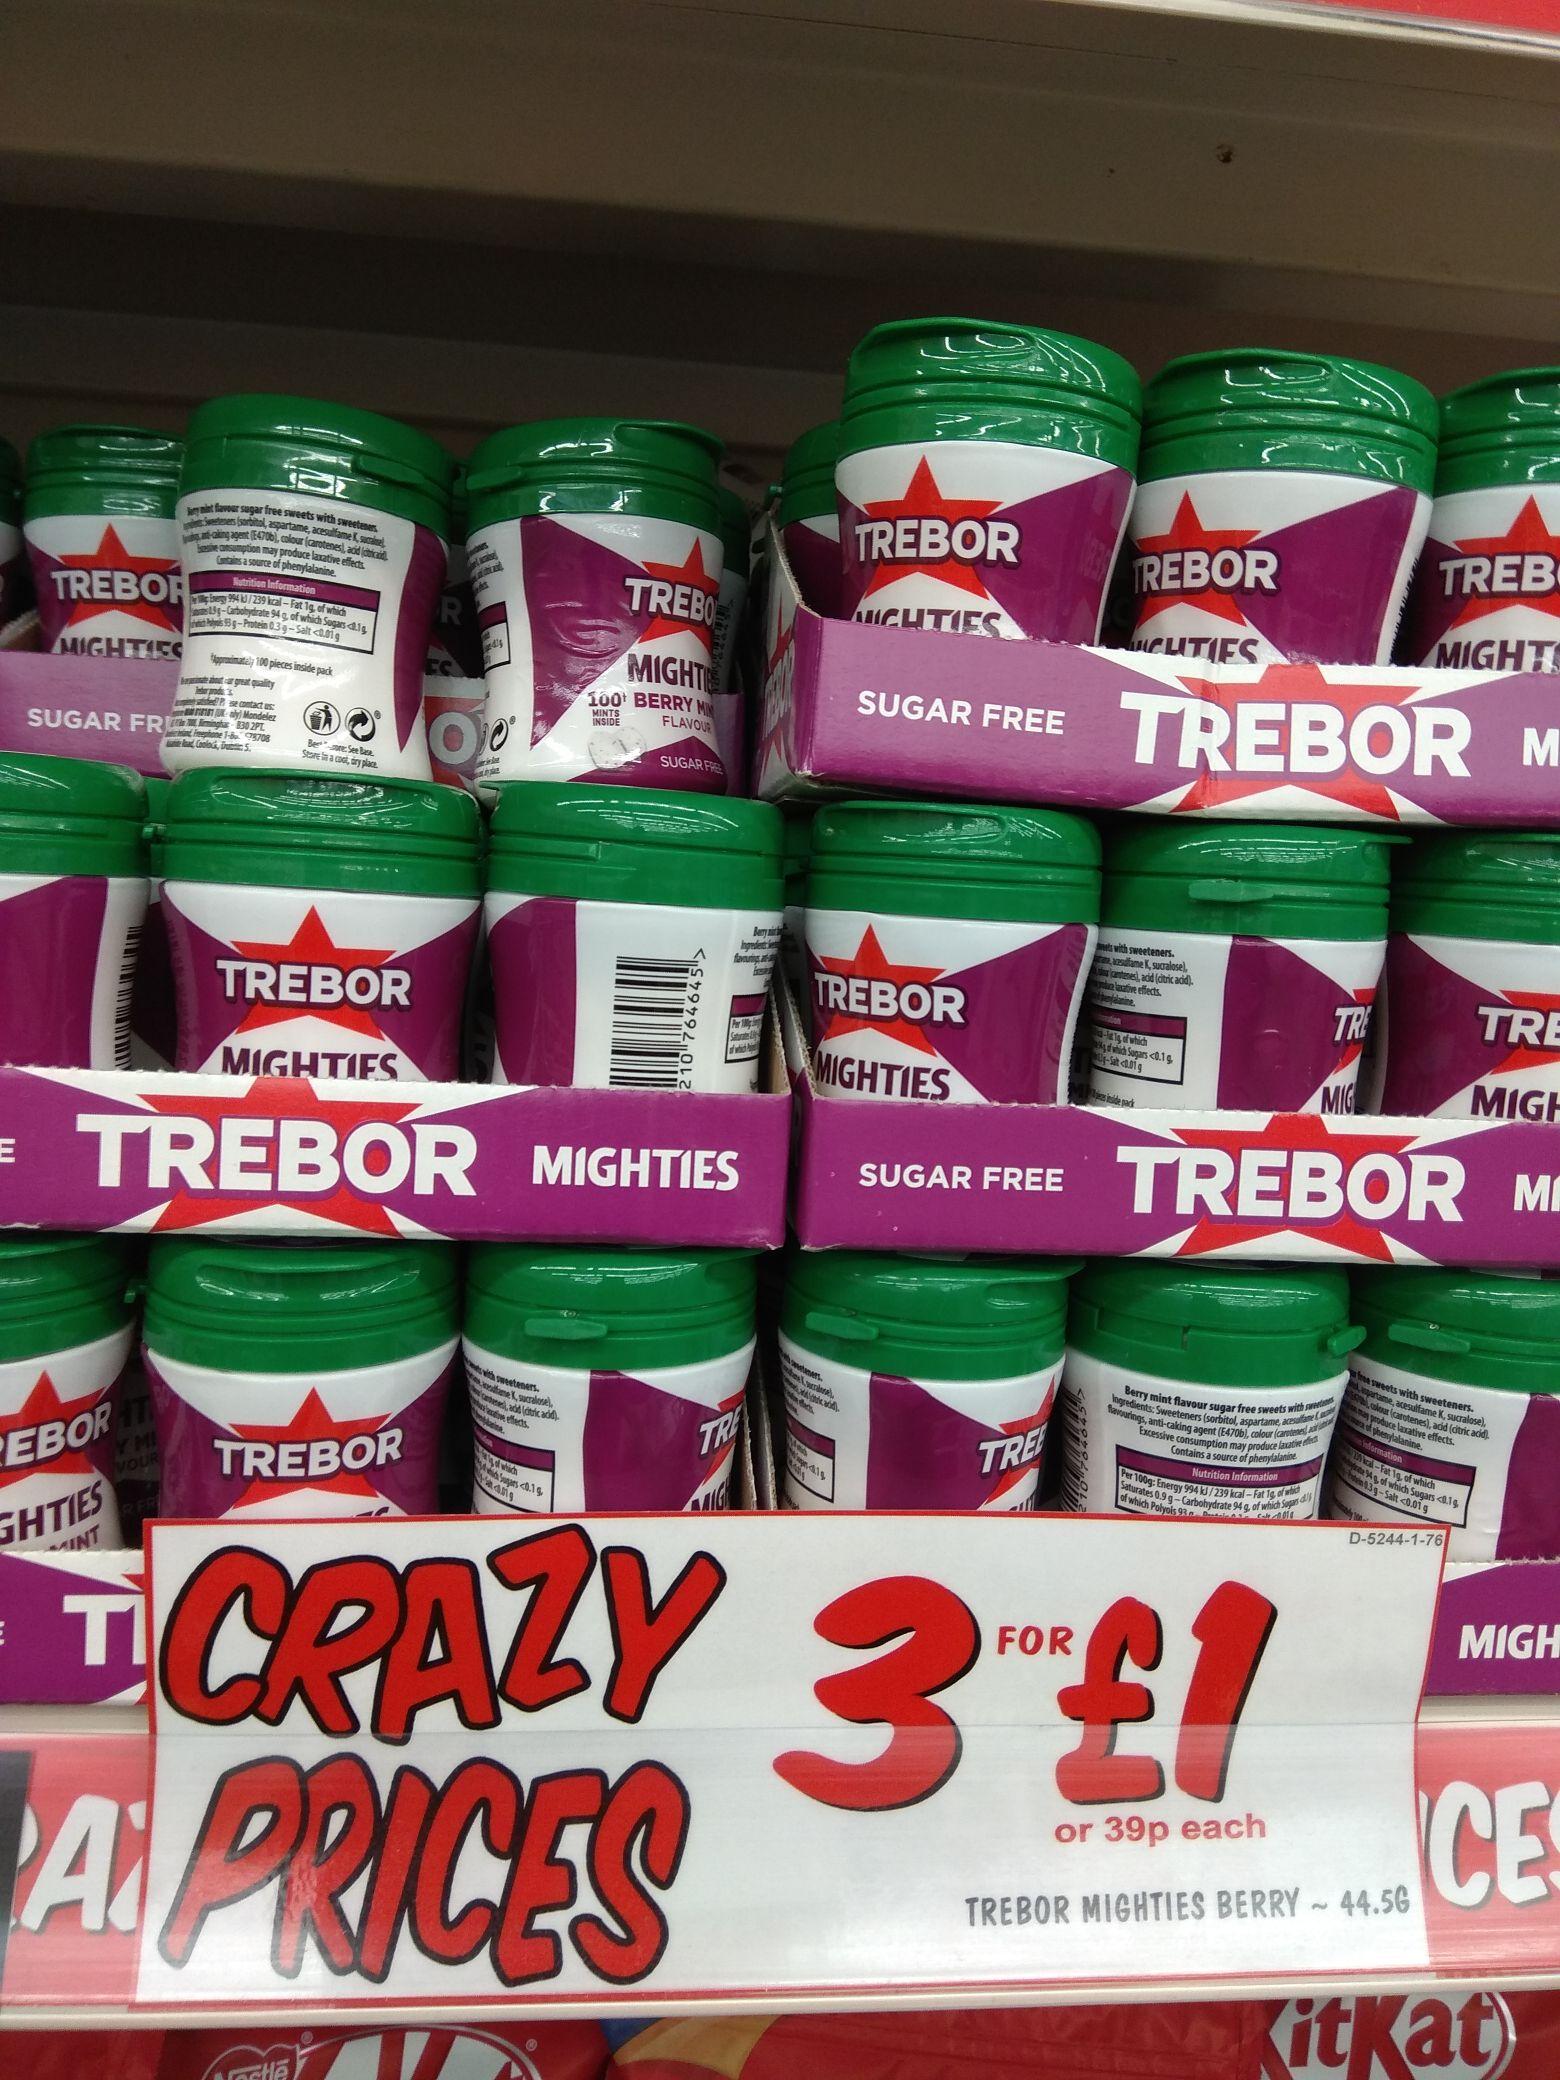 3 x Trebor Mighties Sugar Free Berry Mint 44.5g (100 pack) tubs - £1 @ Fulton Foods